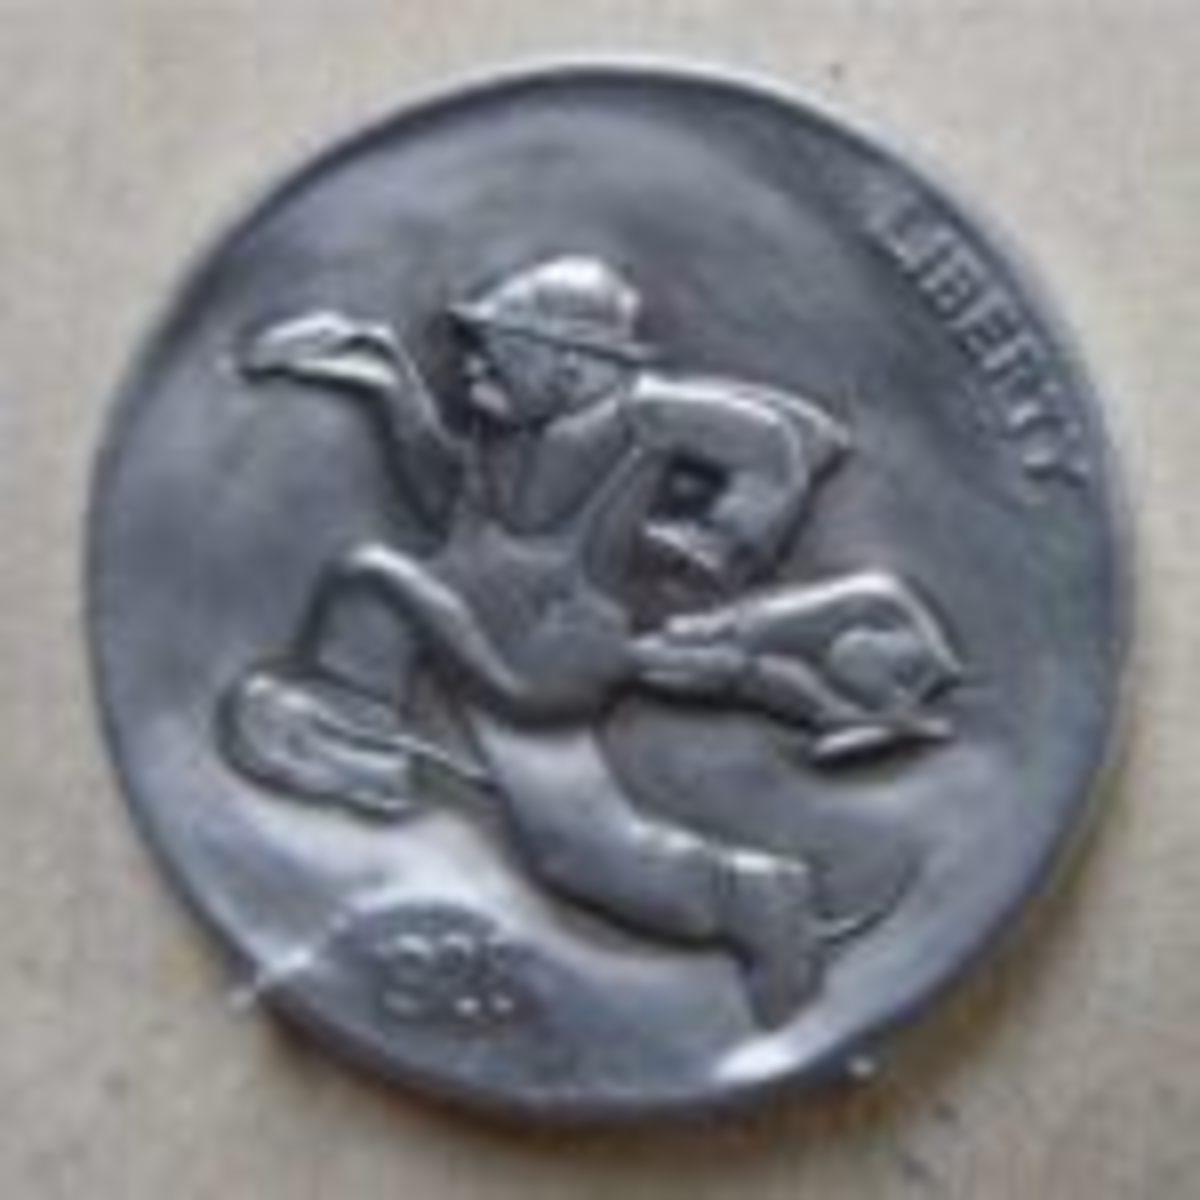 Bob Shamey carved this whimsical cartoon hobo nickel using a 1928 buffalo nickel.